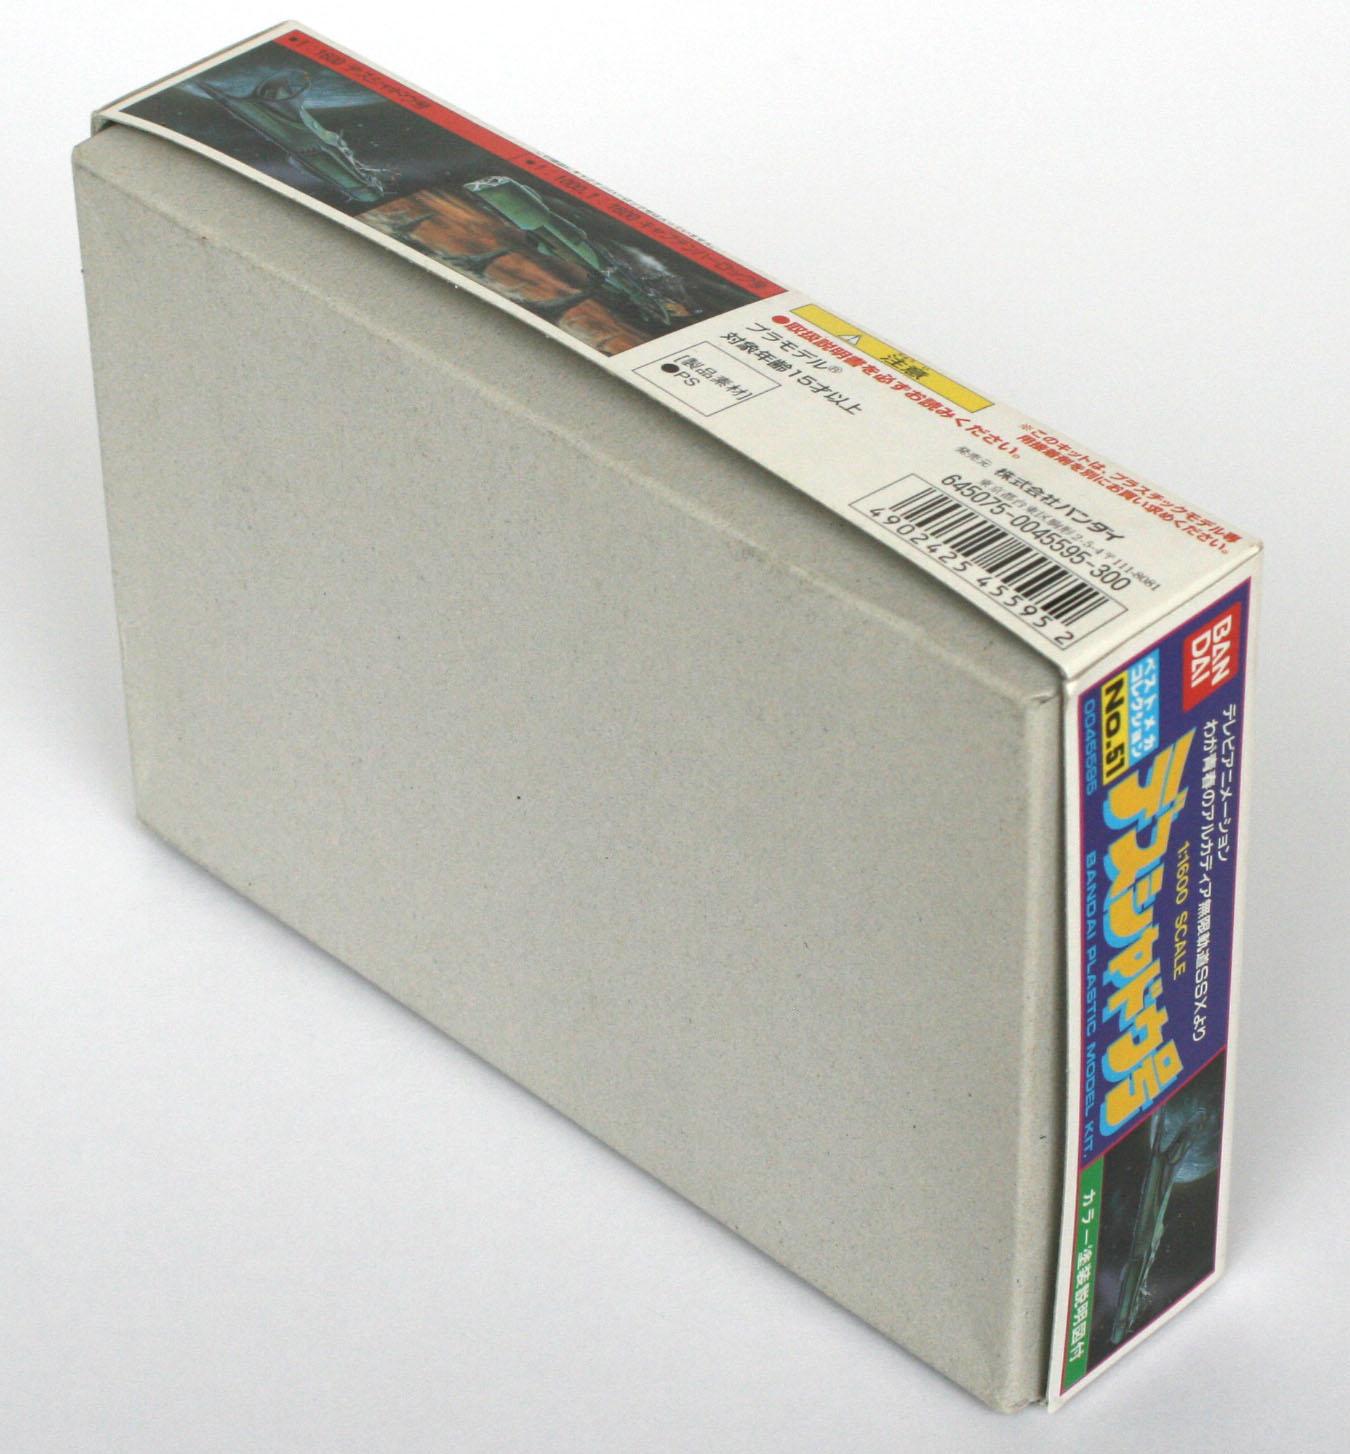 dos du packaging du Death Shadow de Bandai